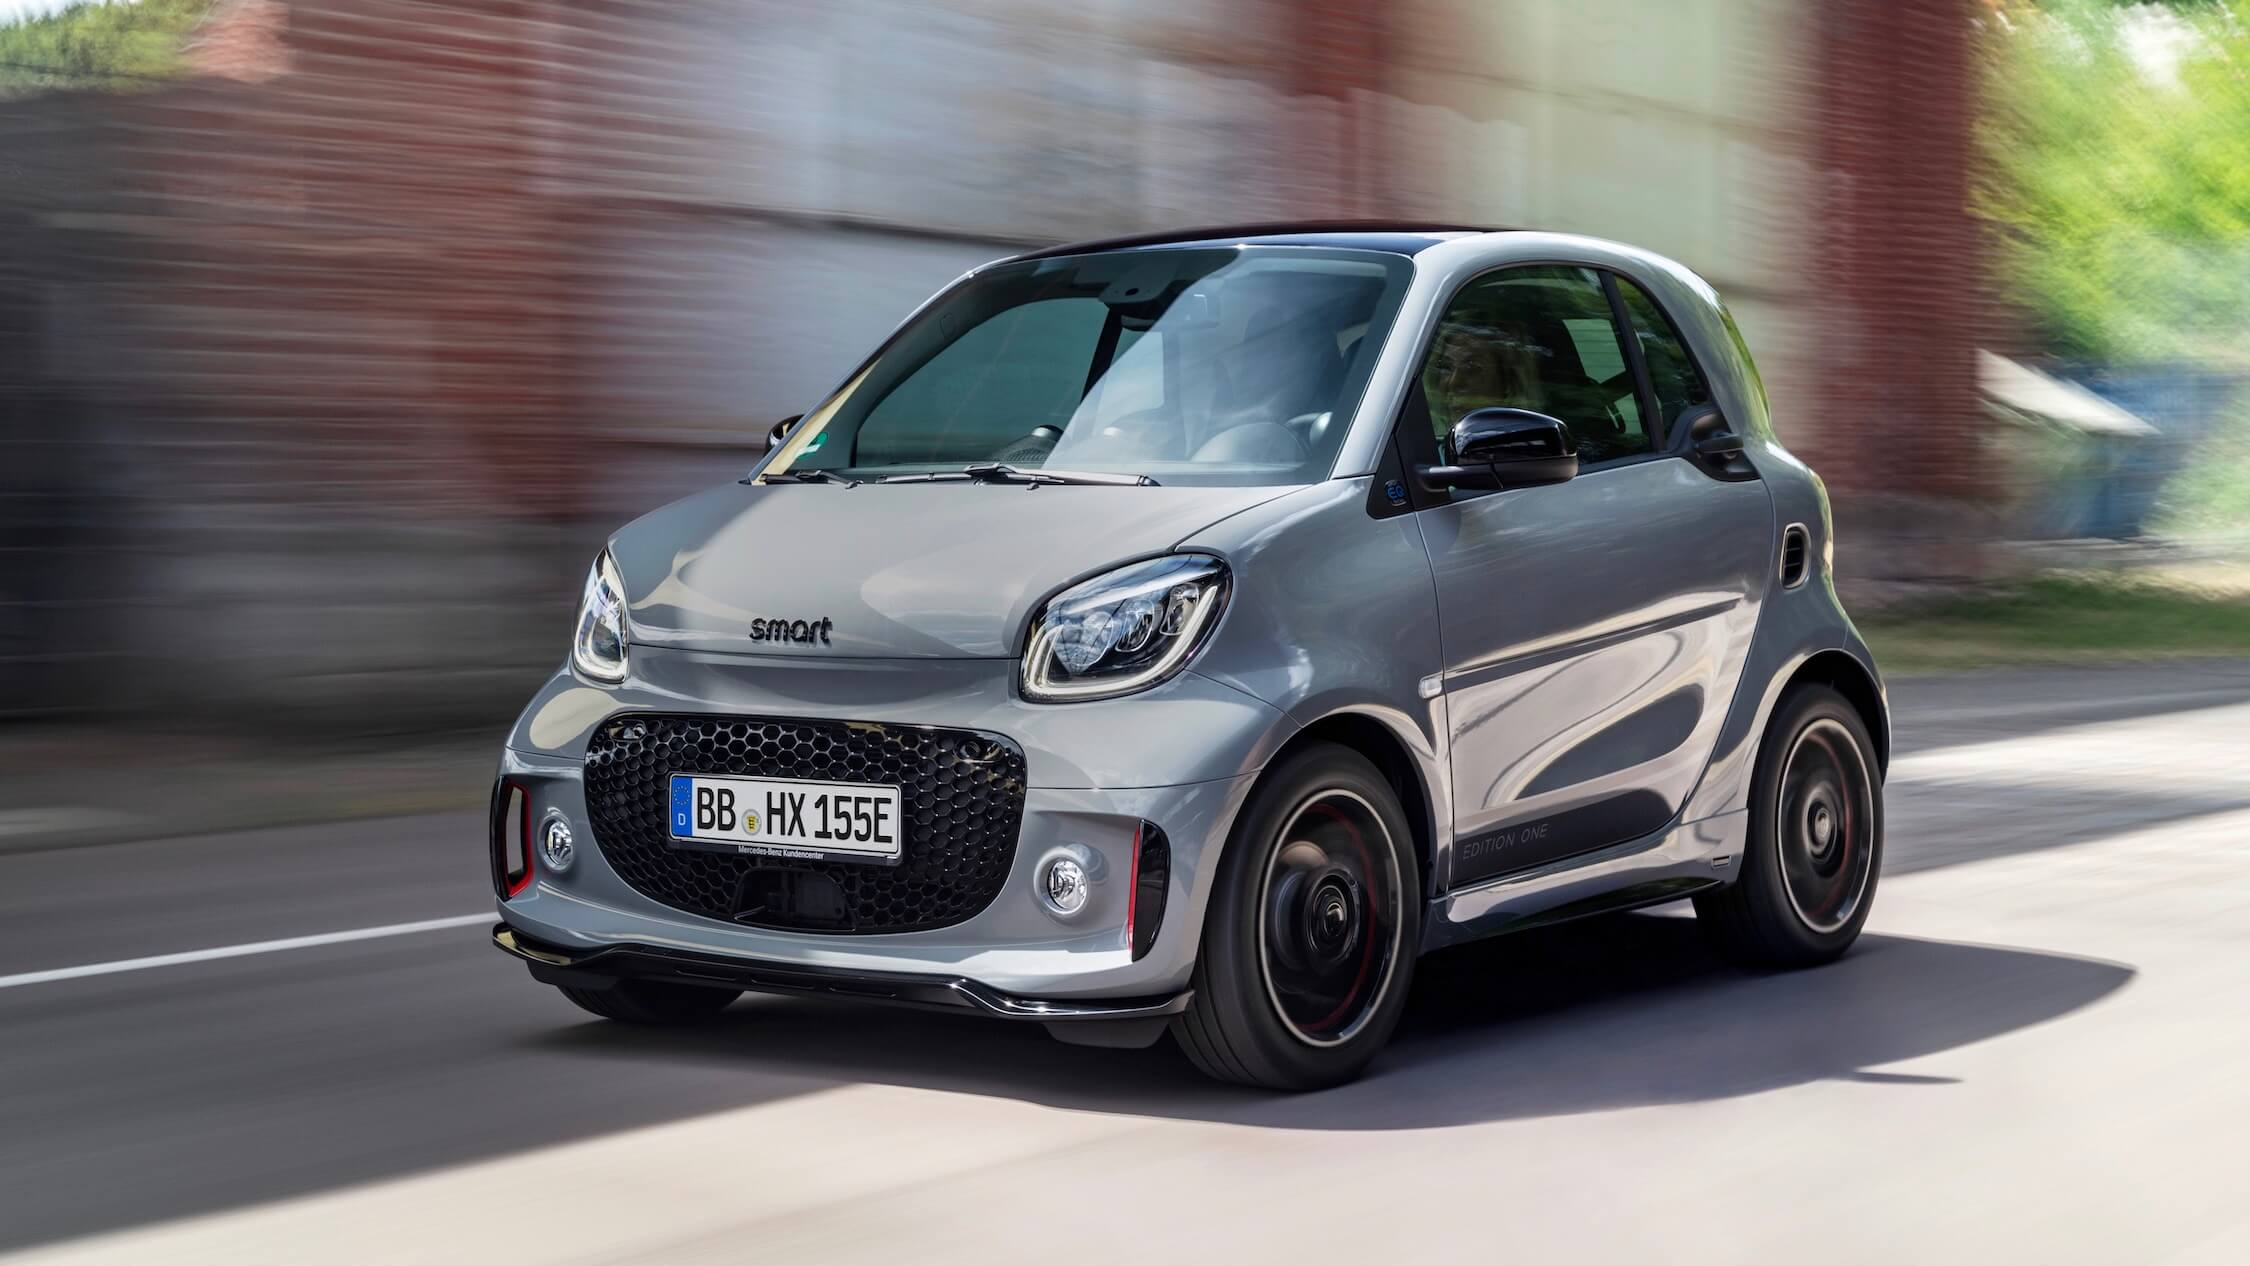 Smart EQ fortwo facelift